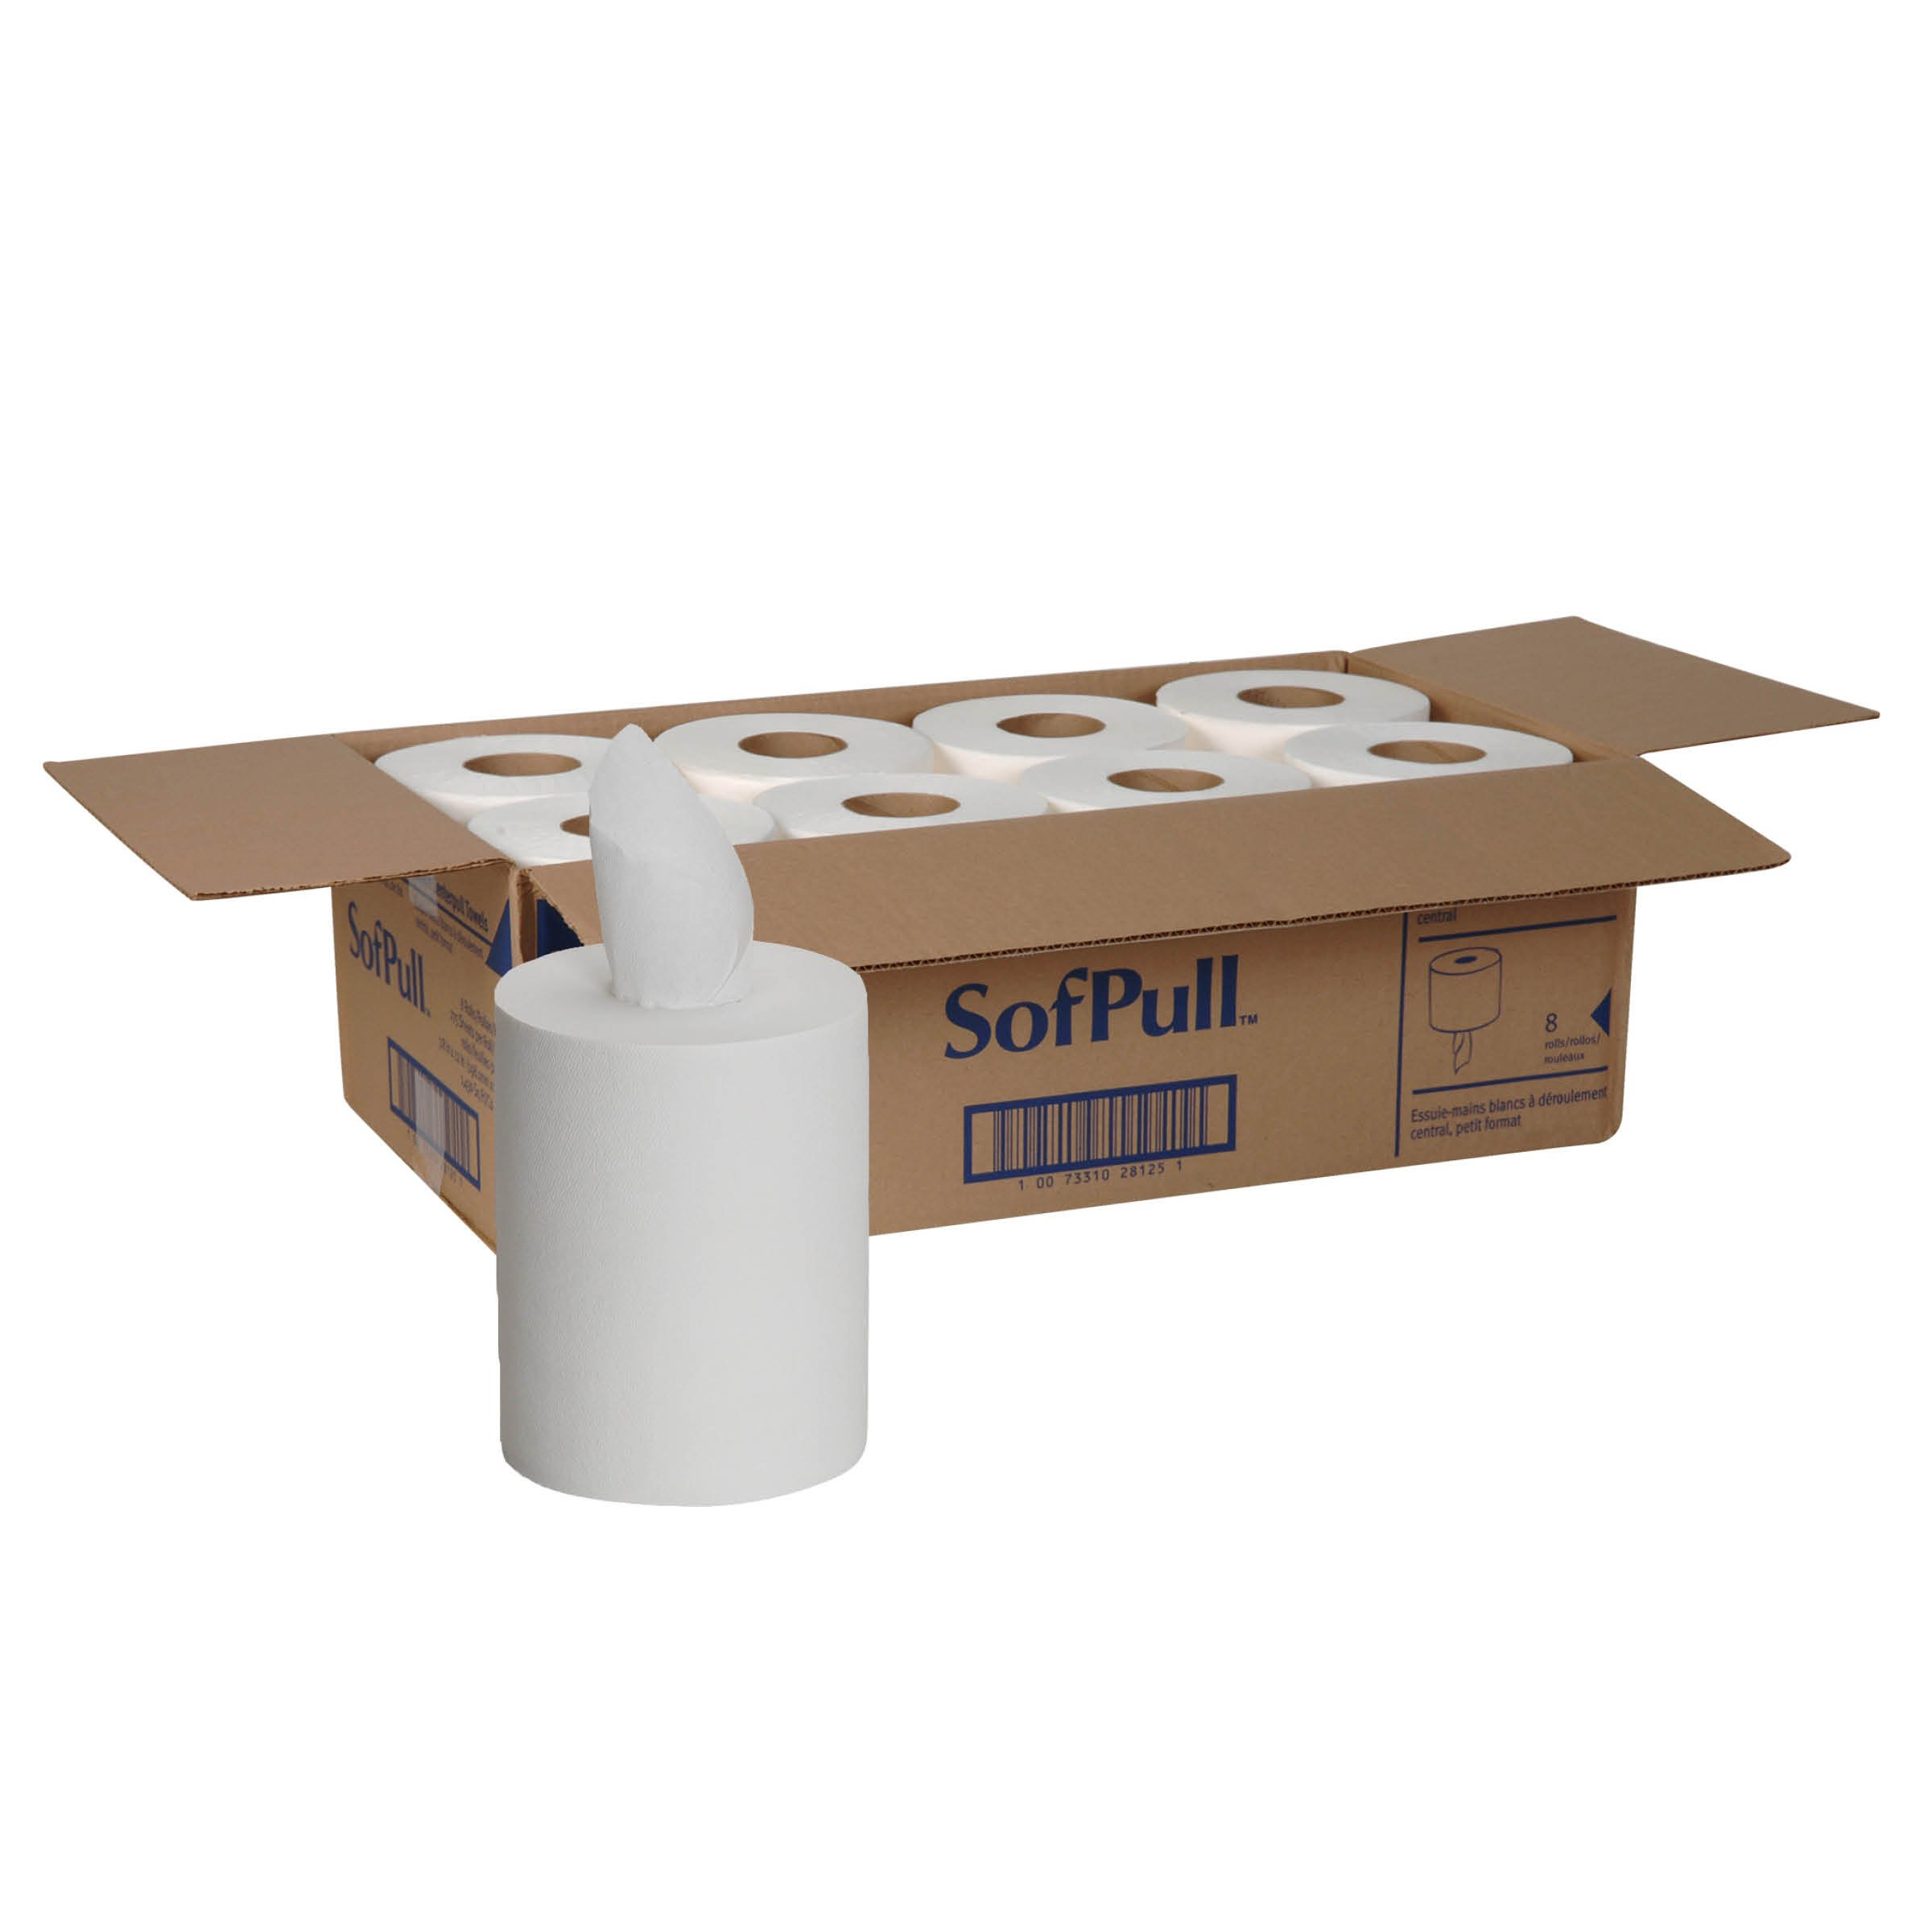 SofPull Centerpull Junior Capacity Paper Towel by GP PRO, White, 28125, 275 Sheets Per Roll, 8 Rolls Per Case